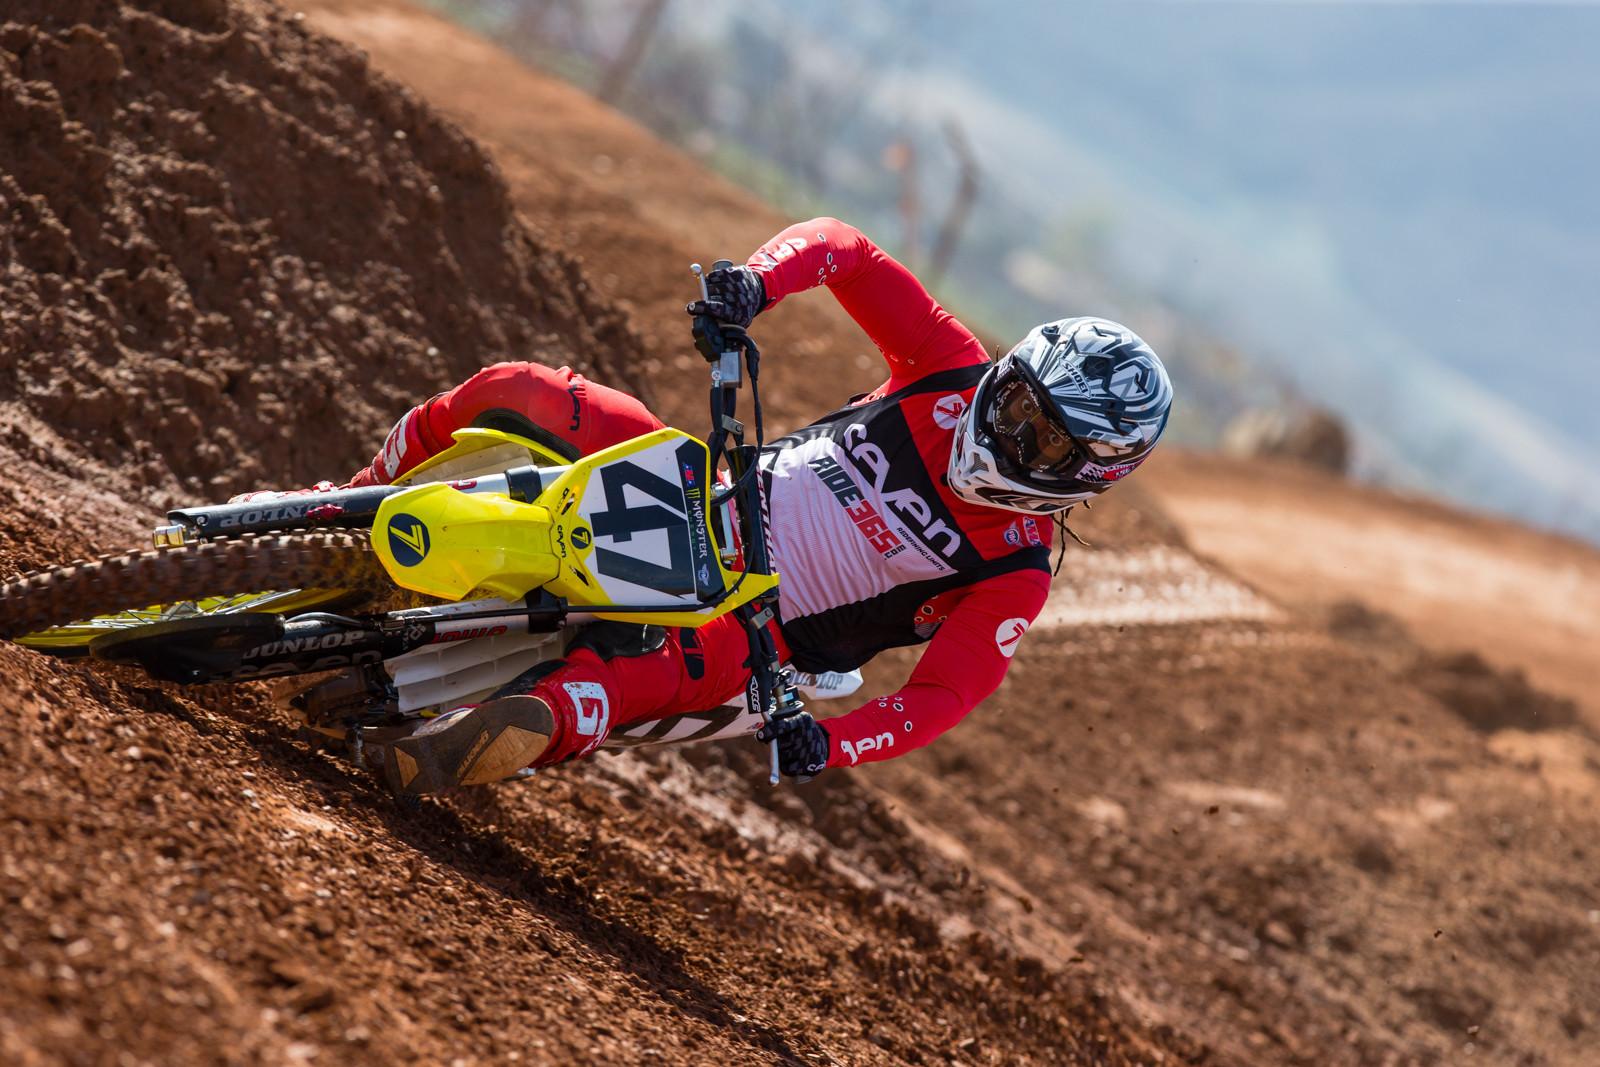 Malcolm Stewart - Supercross 2017: Prepping for Oakland - Motocross Pictures - Vital MX